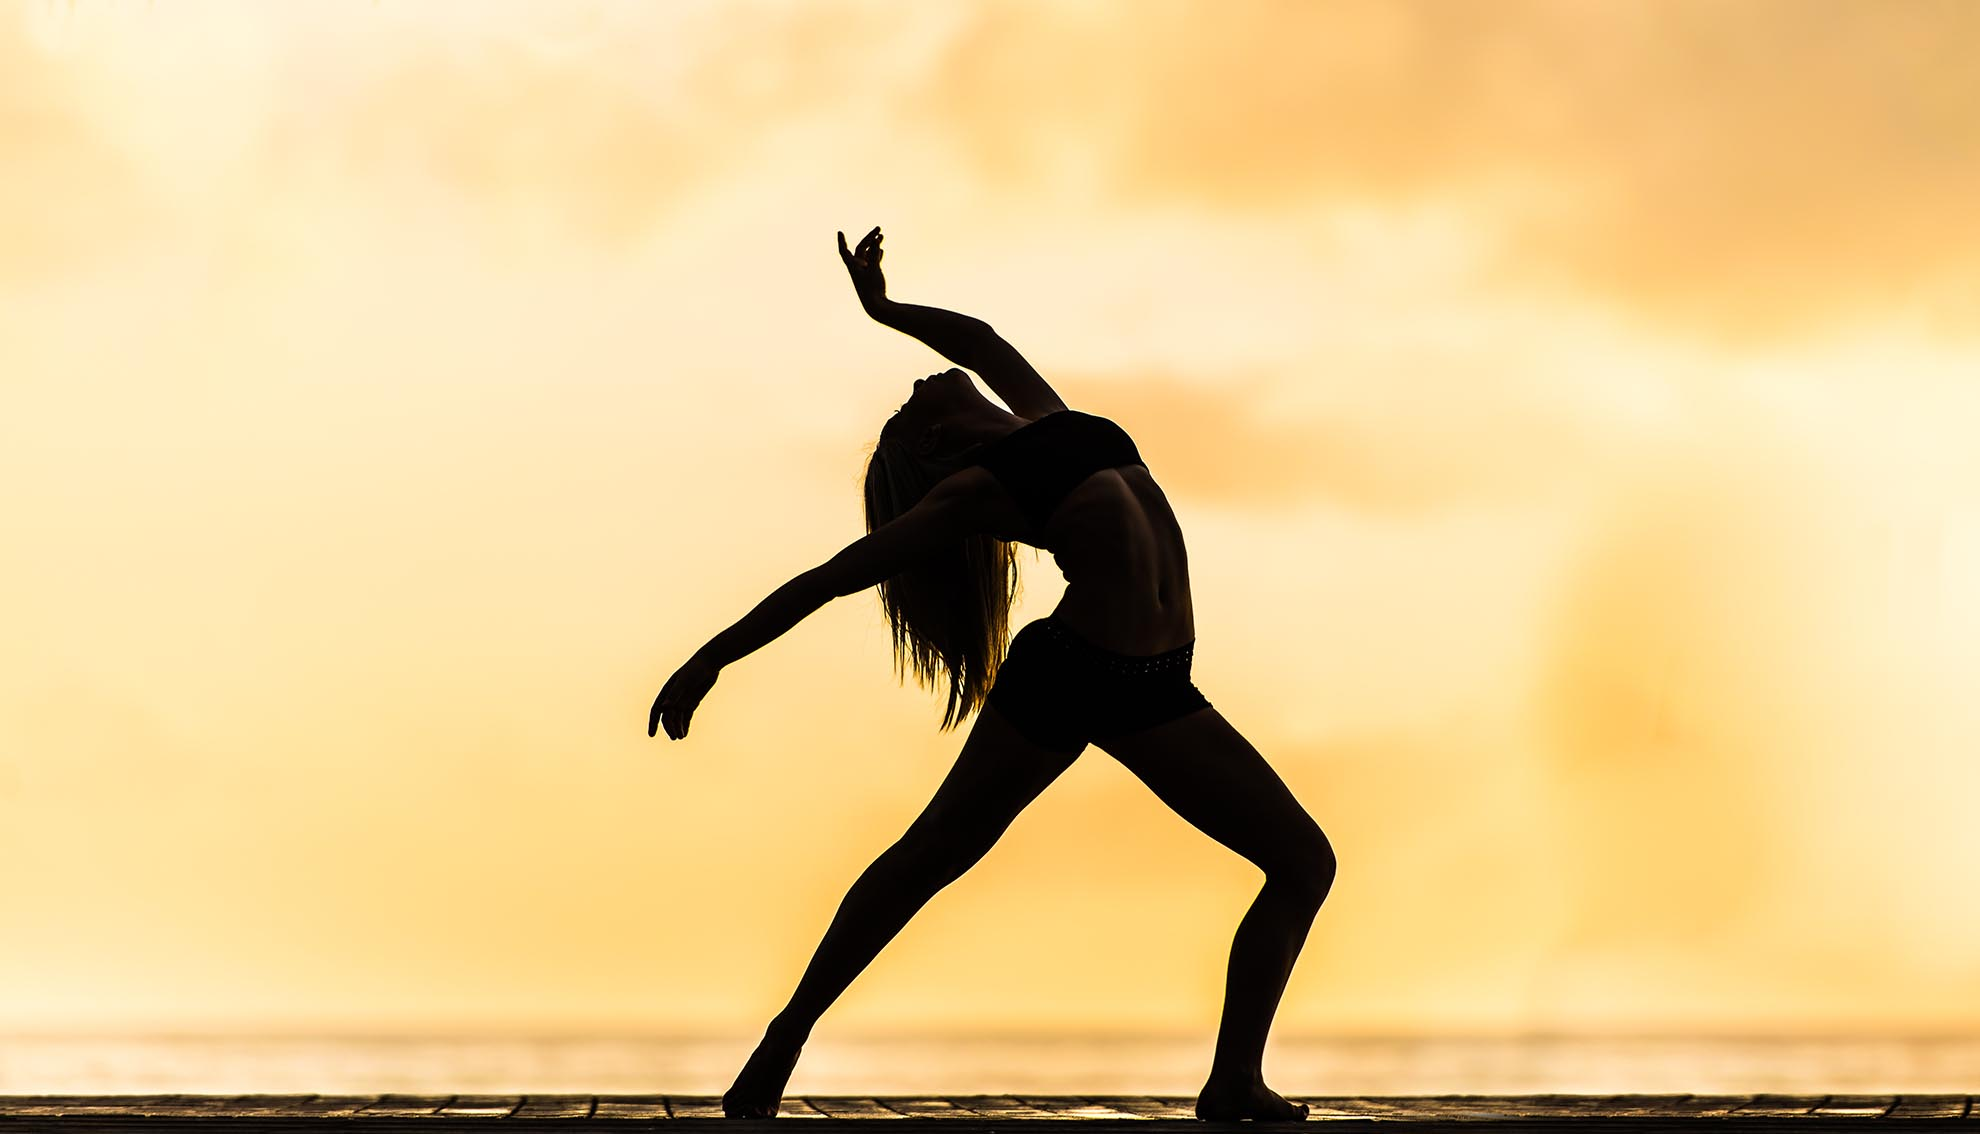 How to Enjoy a Good Morning Yoga Session Without Sacrificing Sleep